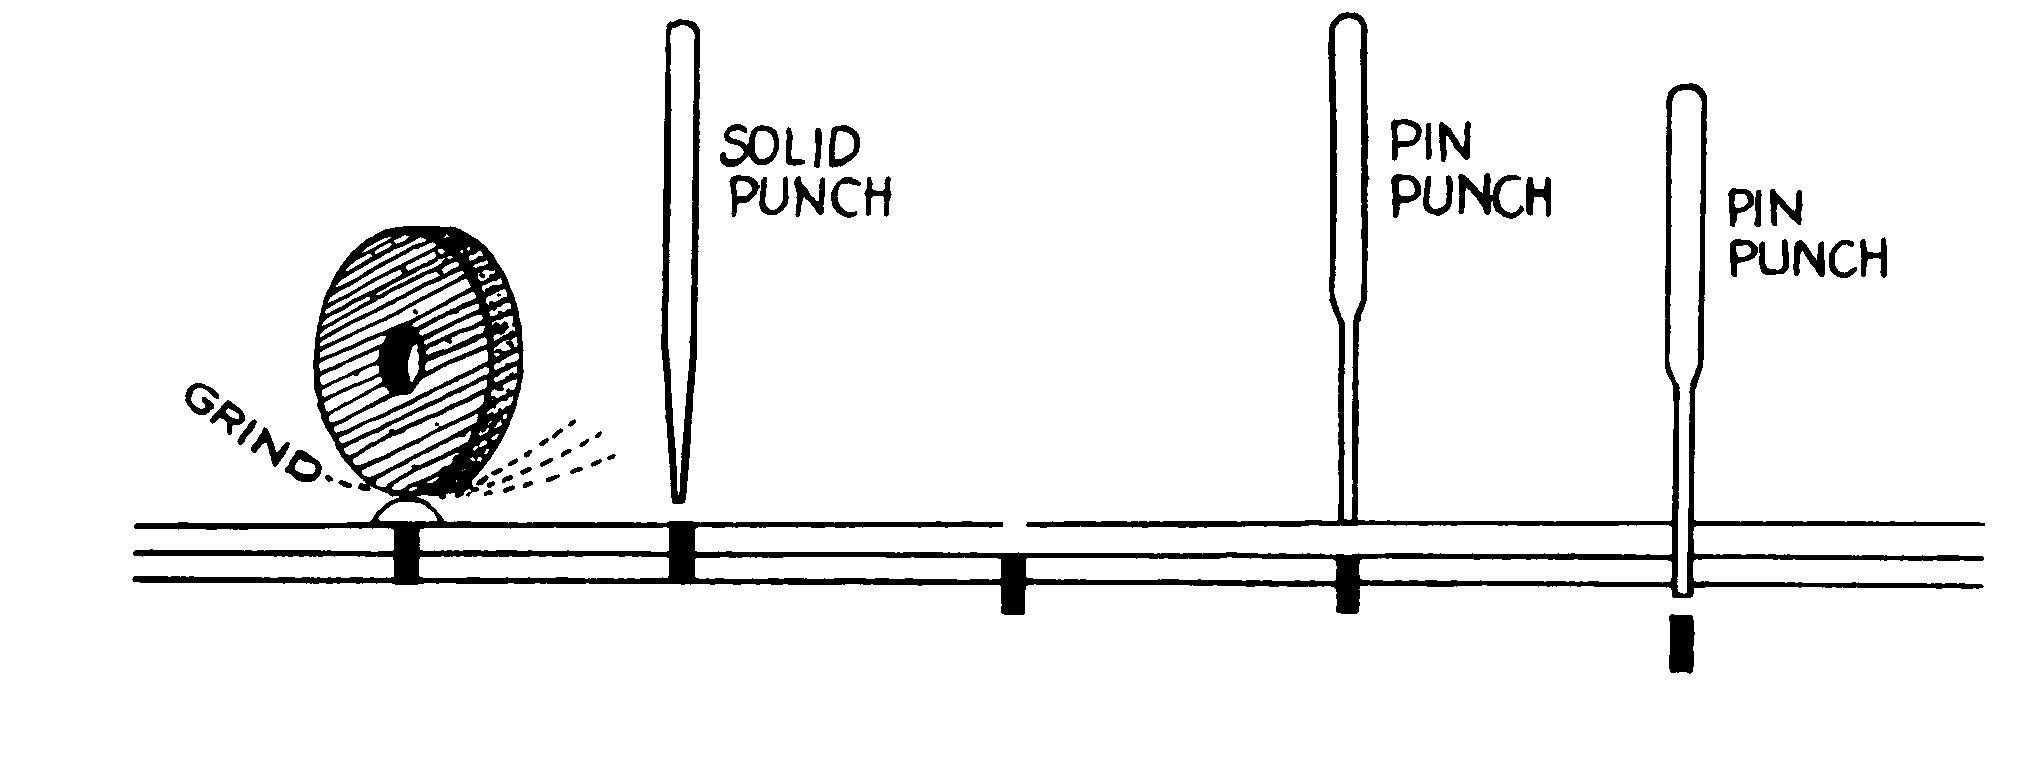 Wilde Tool PLT 432 Long Taper Punch, 1/8 inch